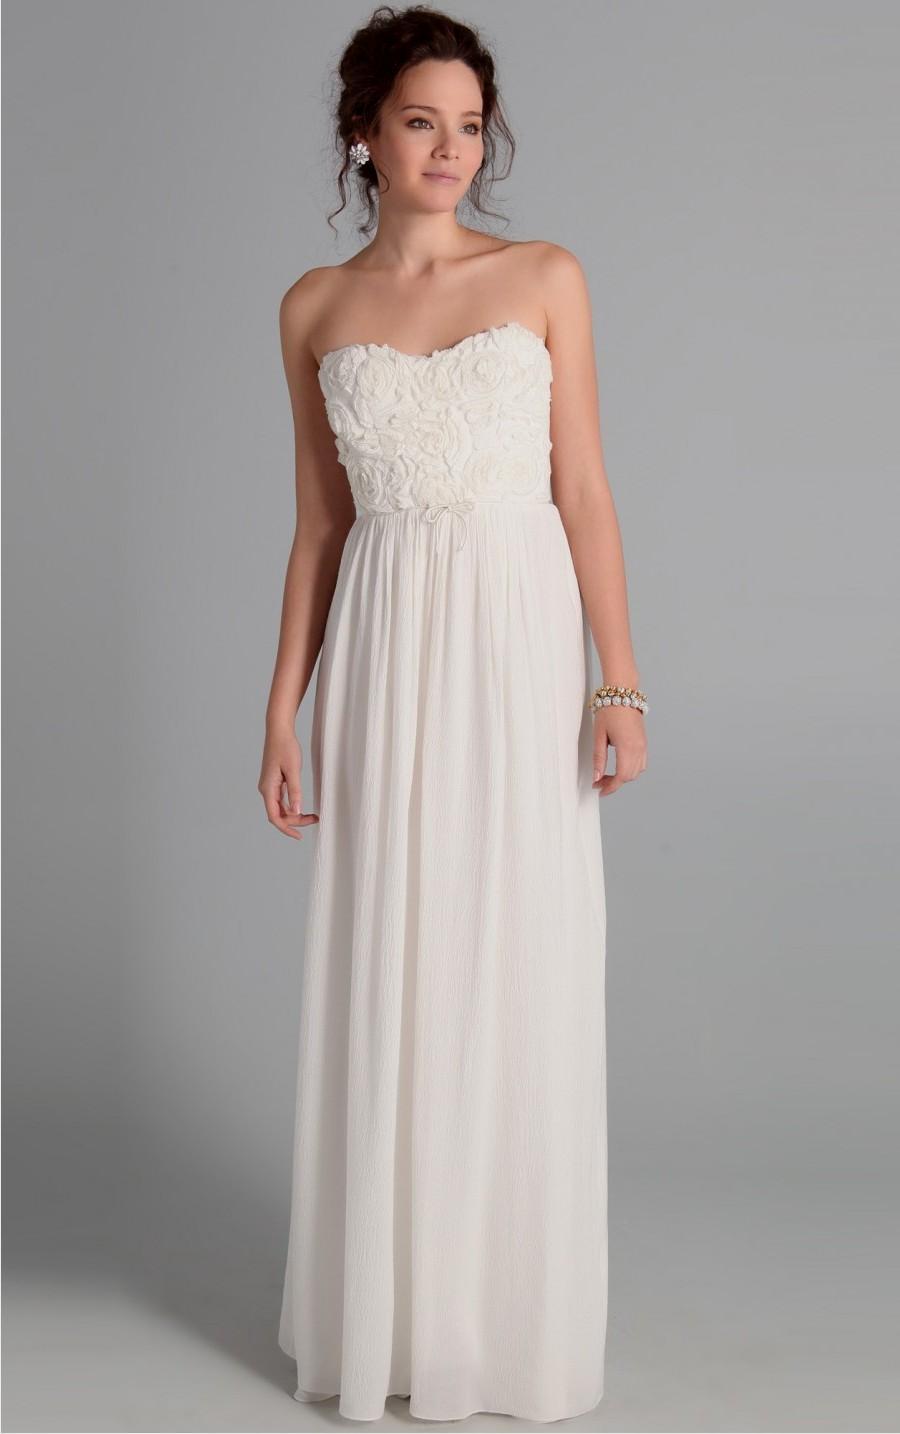 3827603a9261 casual white maxi dresses Naf Dresses